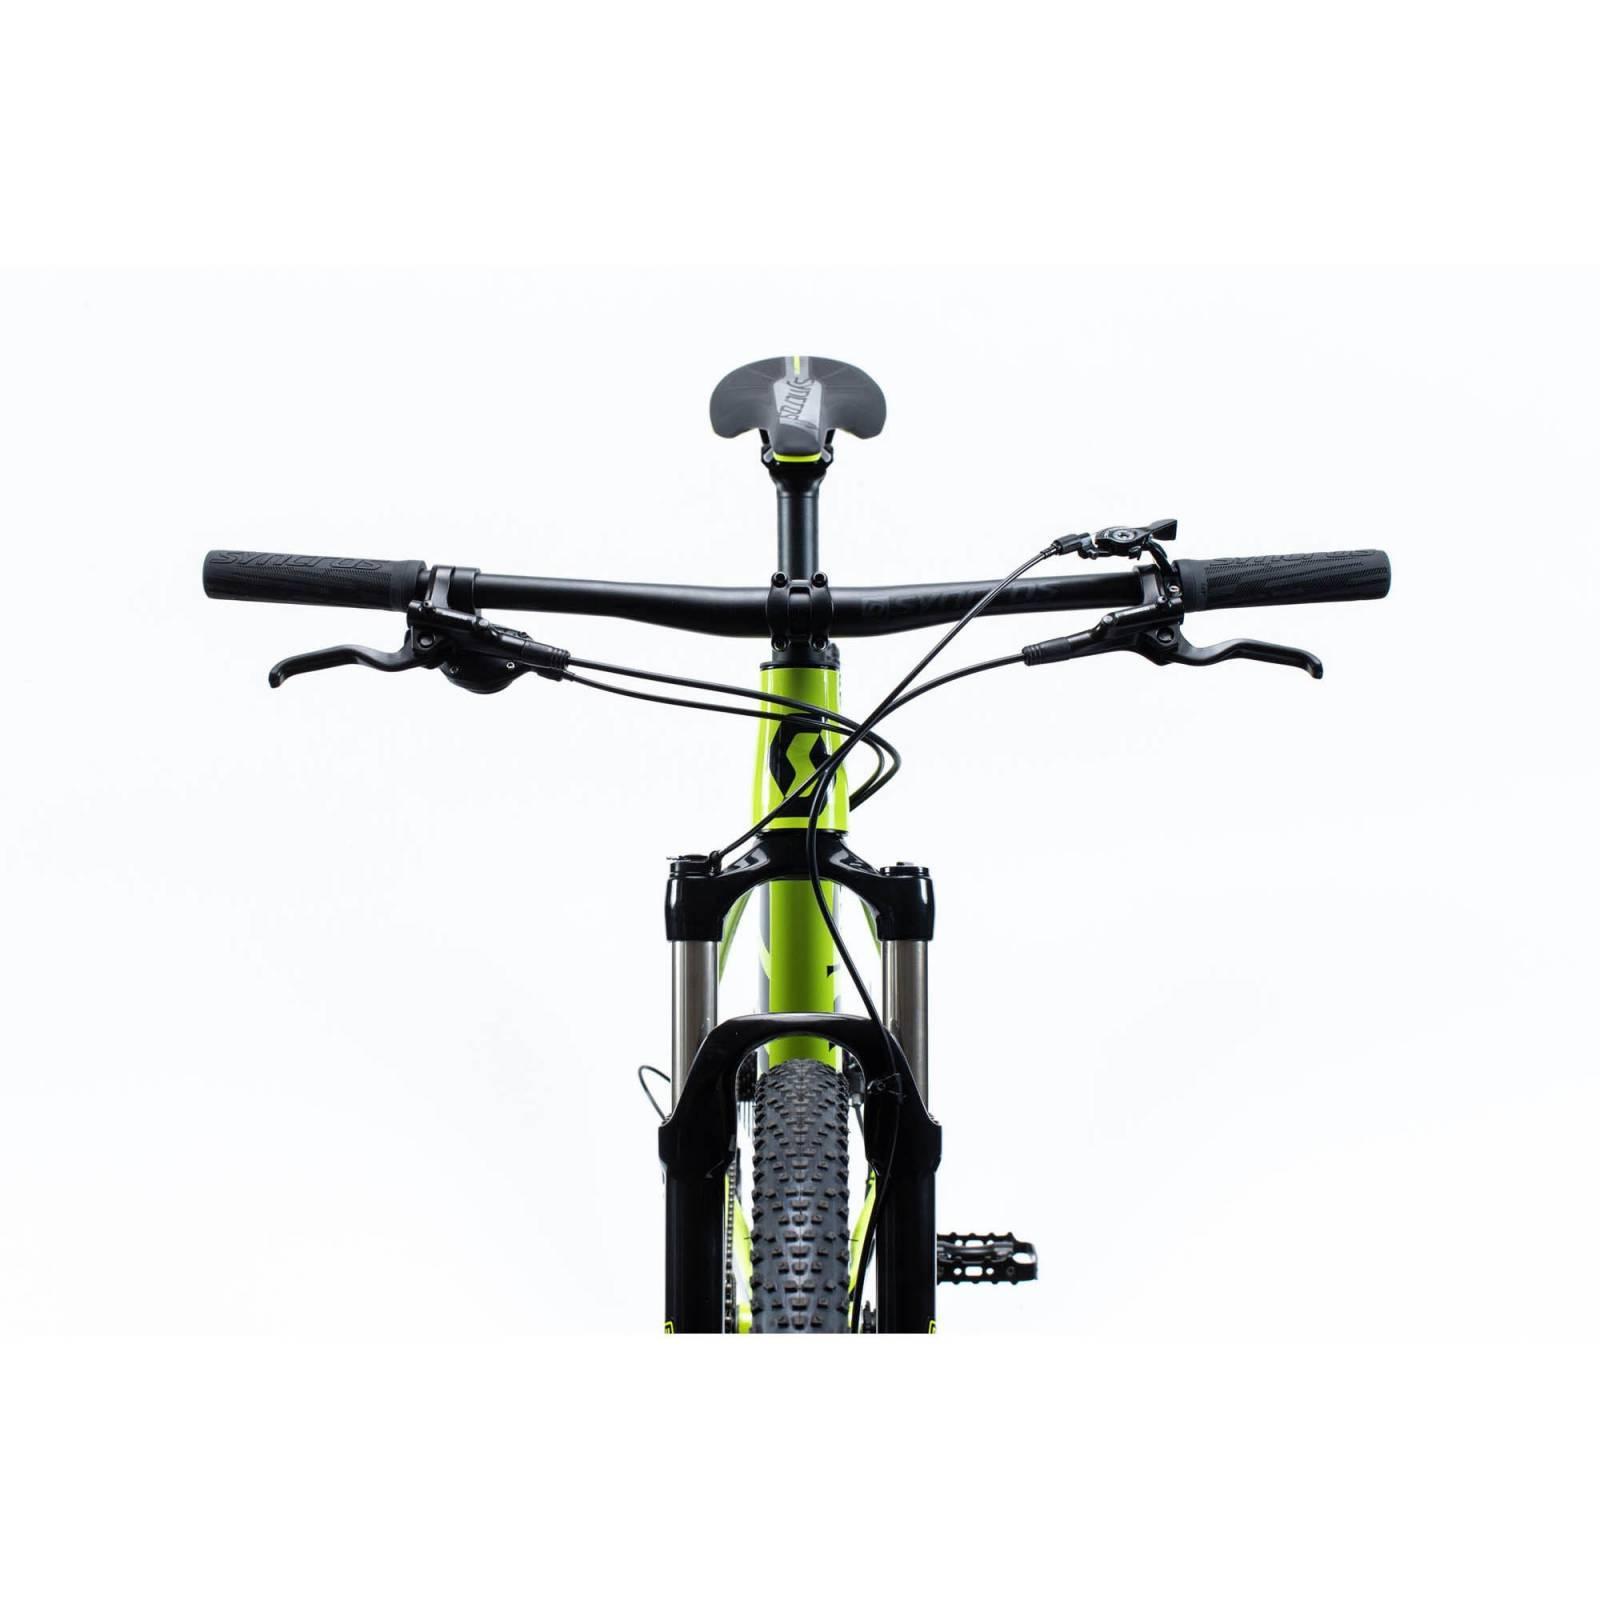 Bicicleta Scott Scale 980 2019 Amarela - Alex Ribeiro Bikes